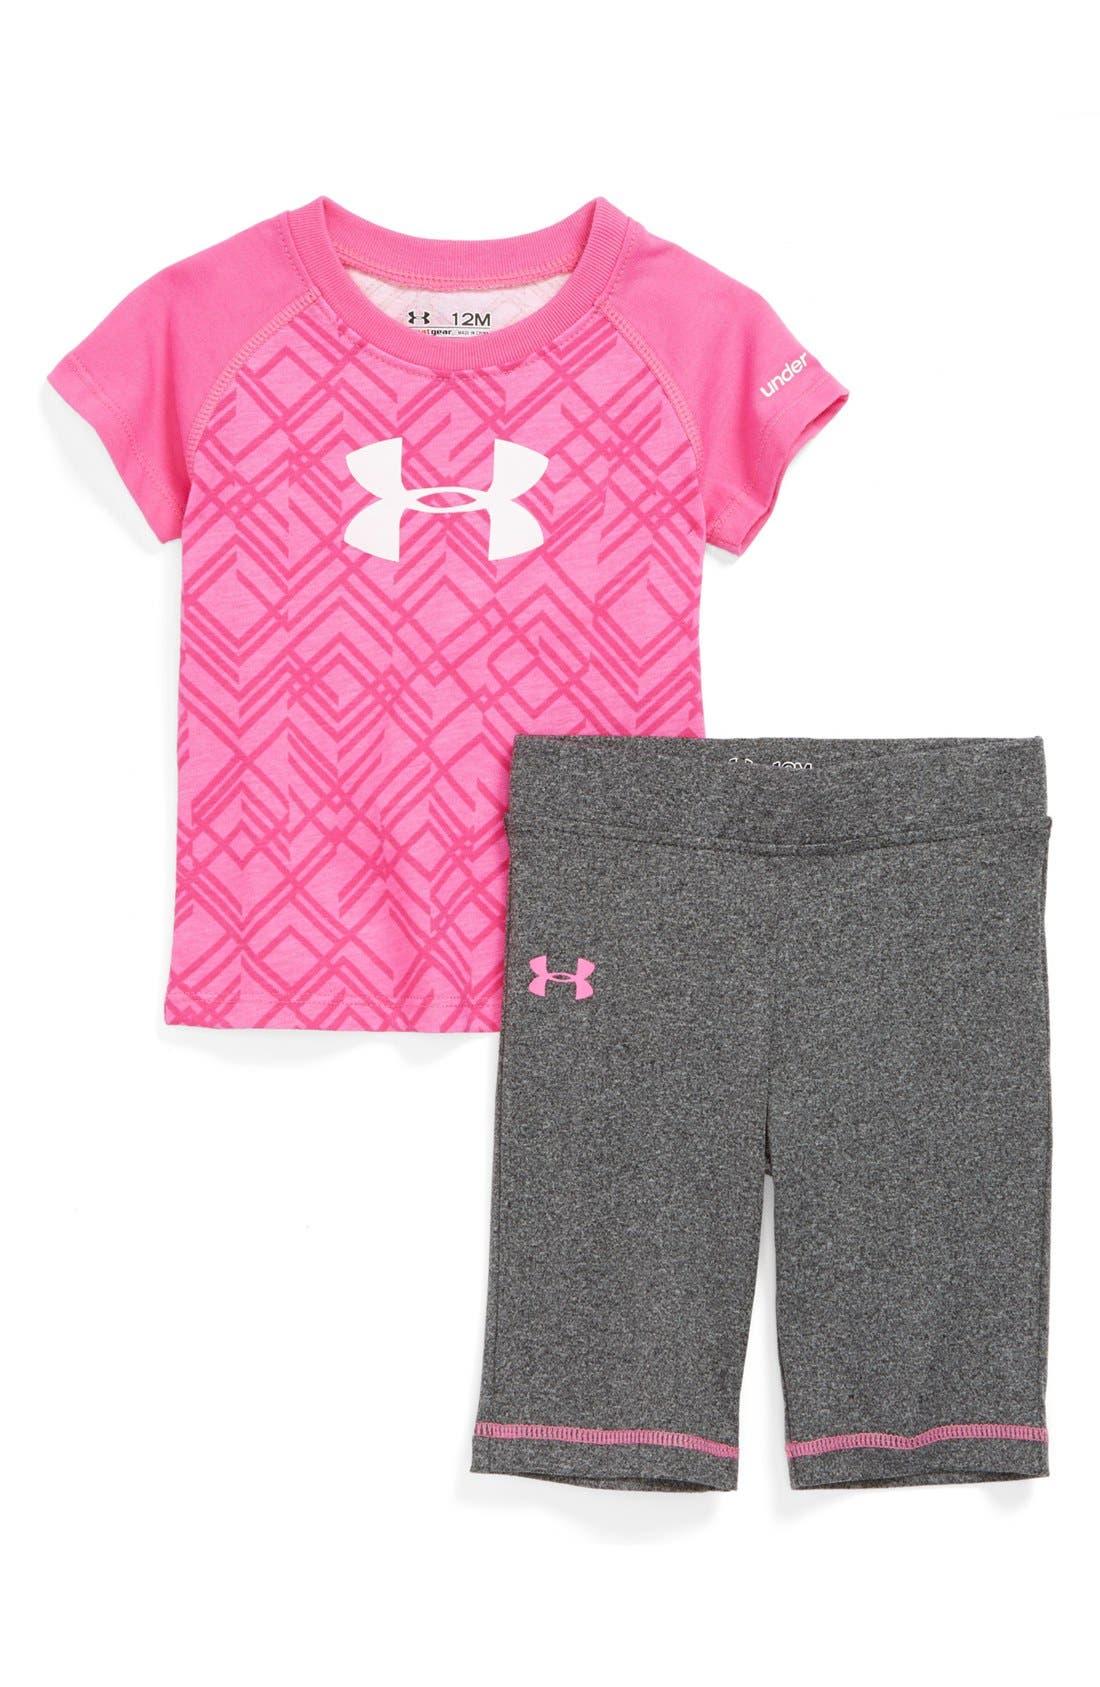 Alternate Image 1 Selected - Under Armour HeatGear® Tee & Pants (Baby Girls)